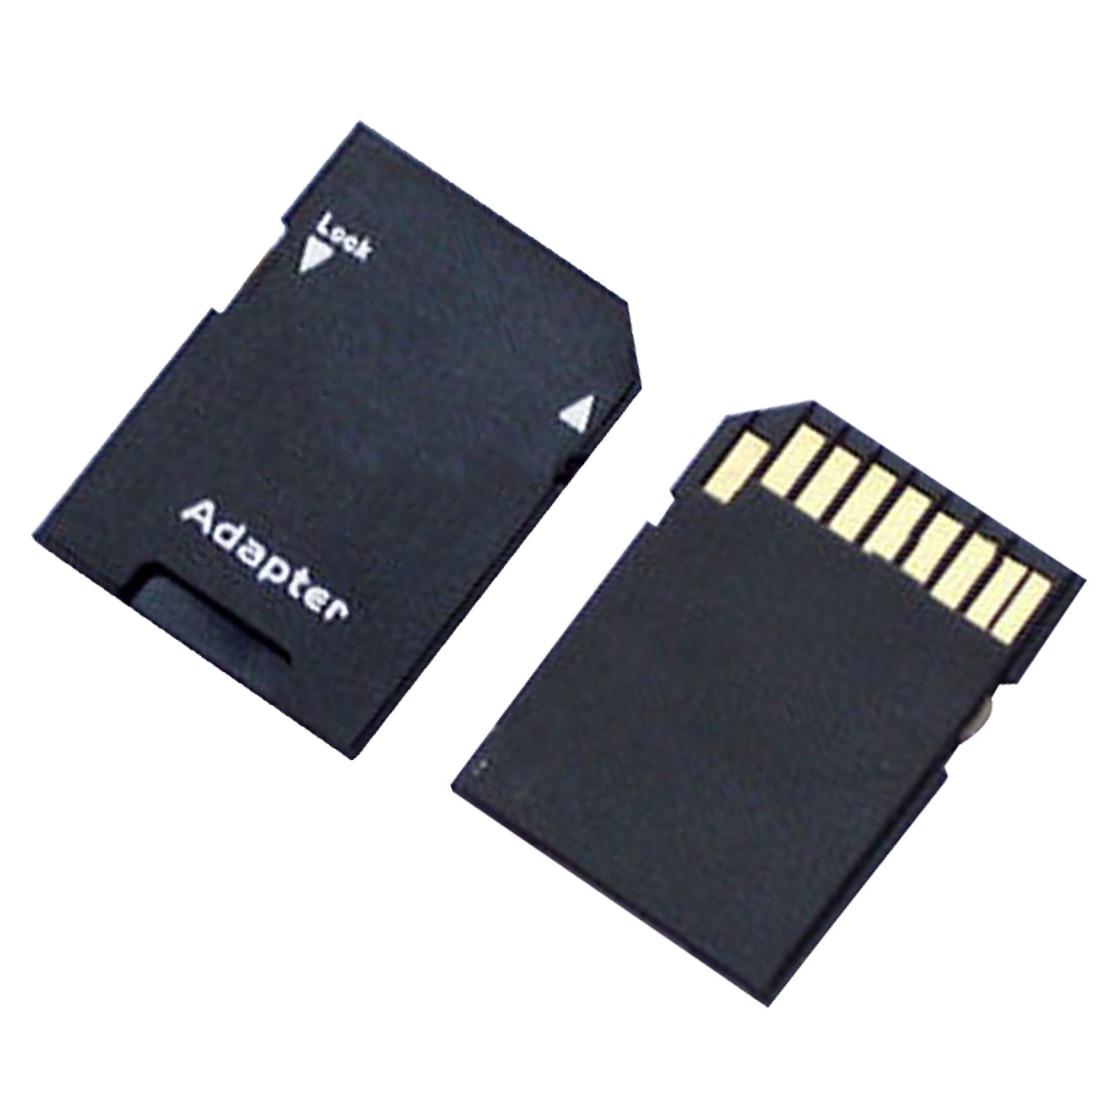 Centechia 2PCS Hot Sale Popular Micro SD TransFlash TF To SD SDHC Memory Card Adapter Convert Into SD Card